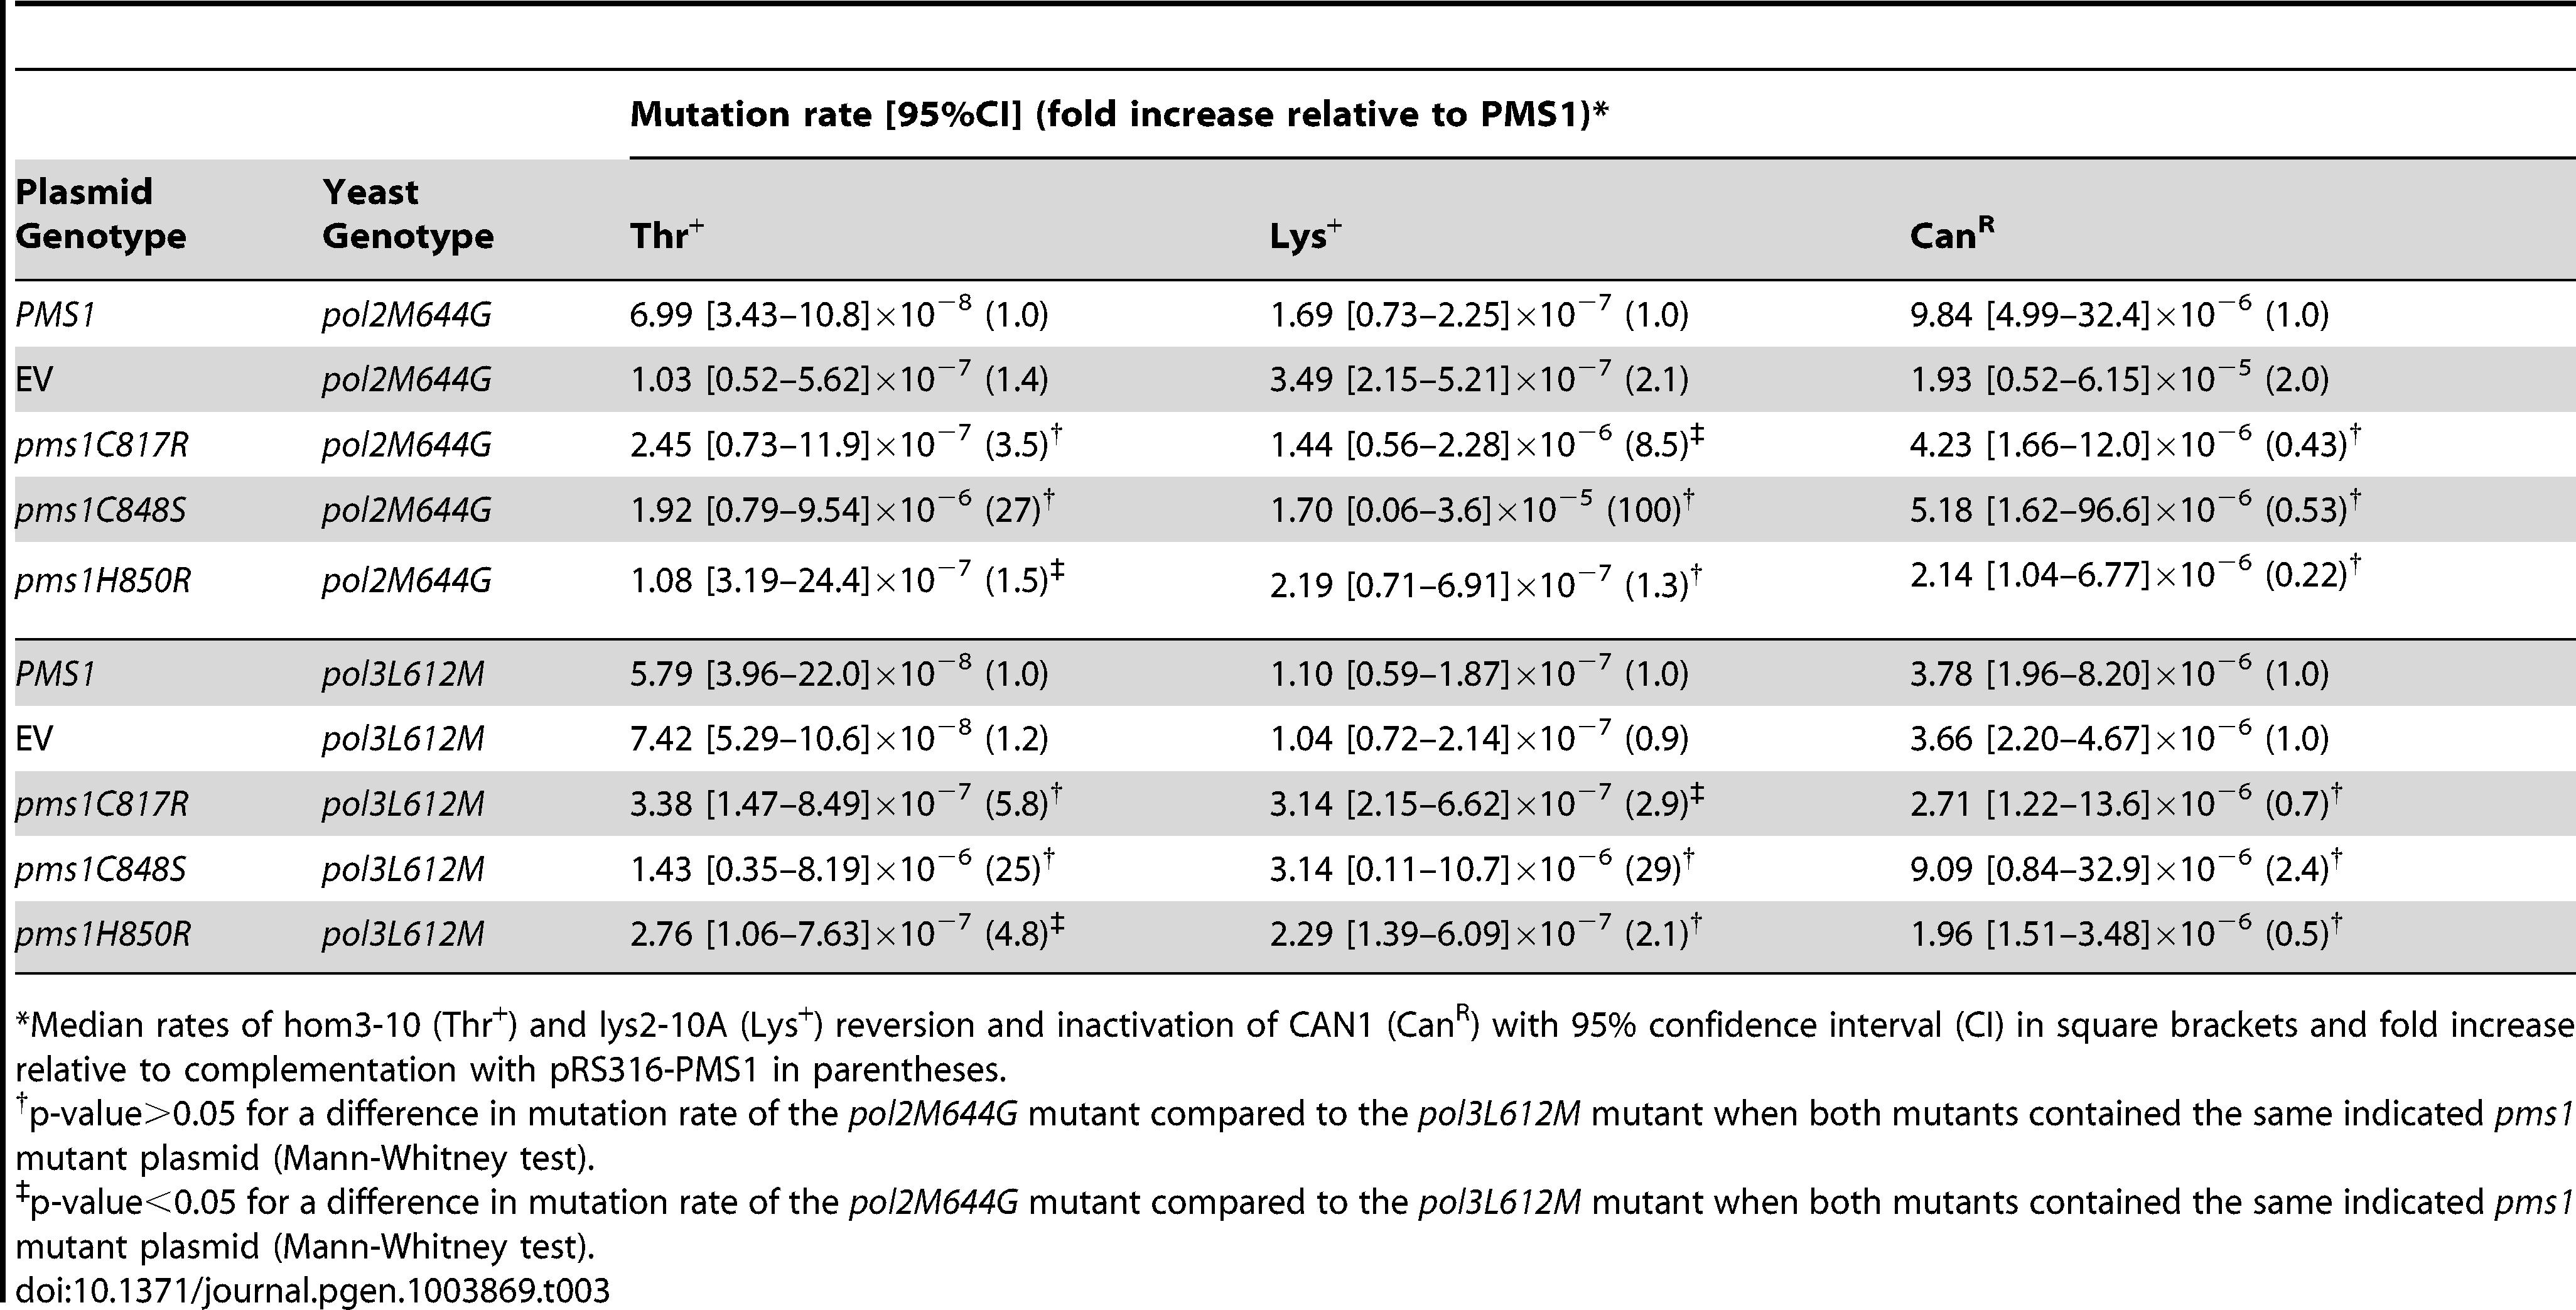 Mutations rates of <i>pms1</i> metal coordination mutants on a low-copy plasmid in polymerase mutant strains <i>pol2M644G</i> and <i>pol3L612M</i>.